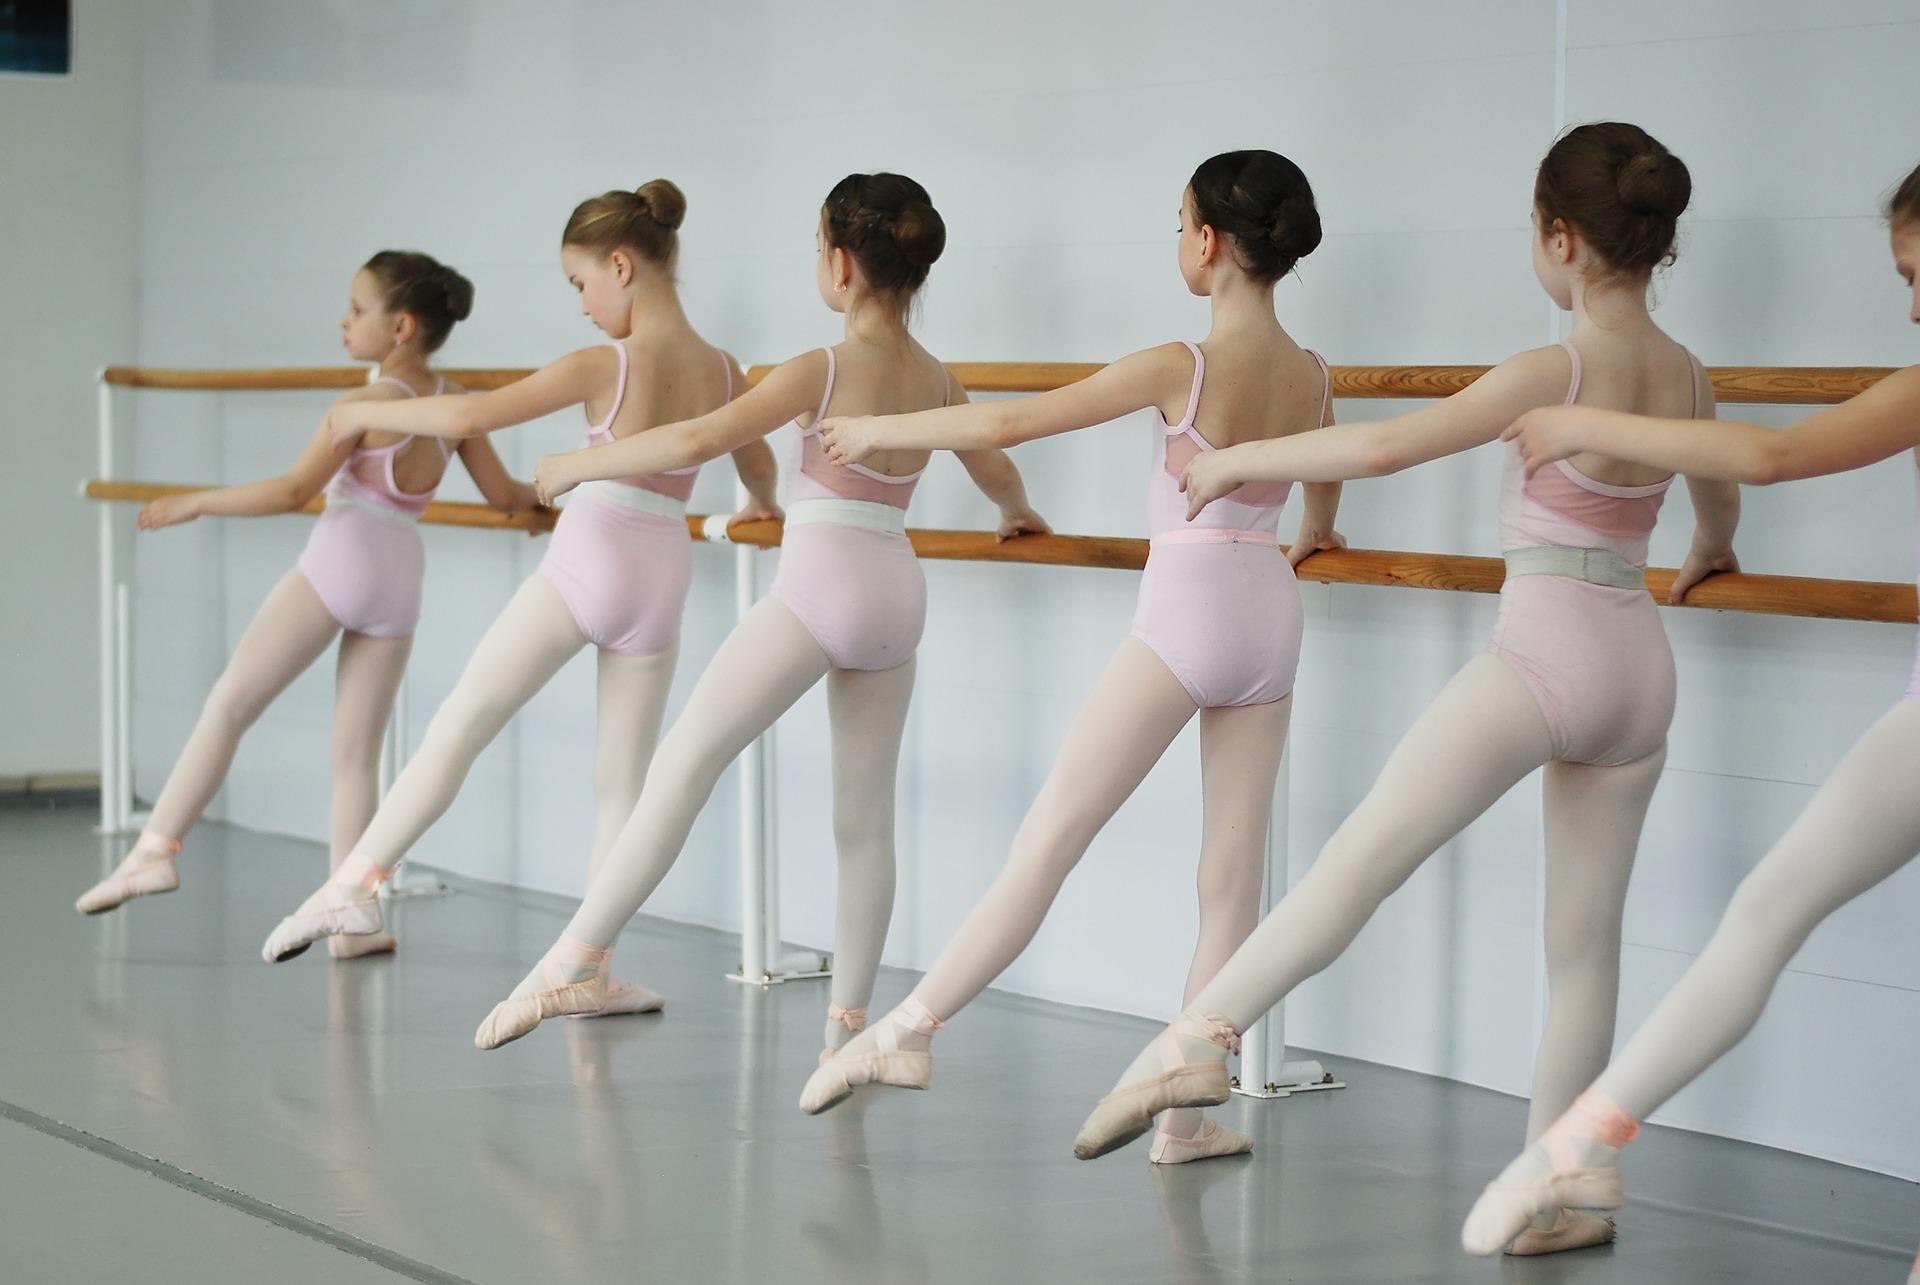 Ballettkurs in der Ballettschule Schoofs Carell